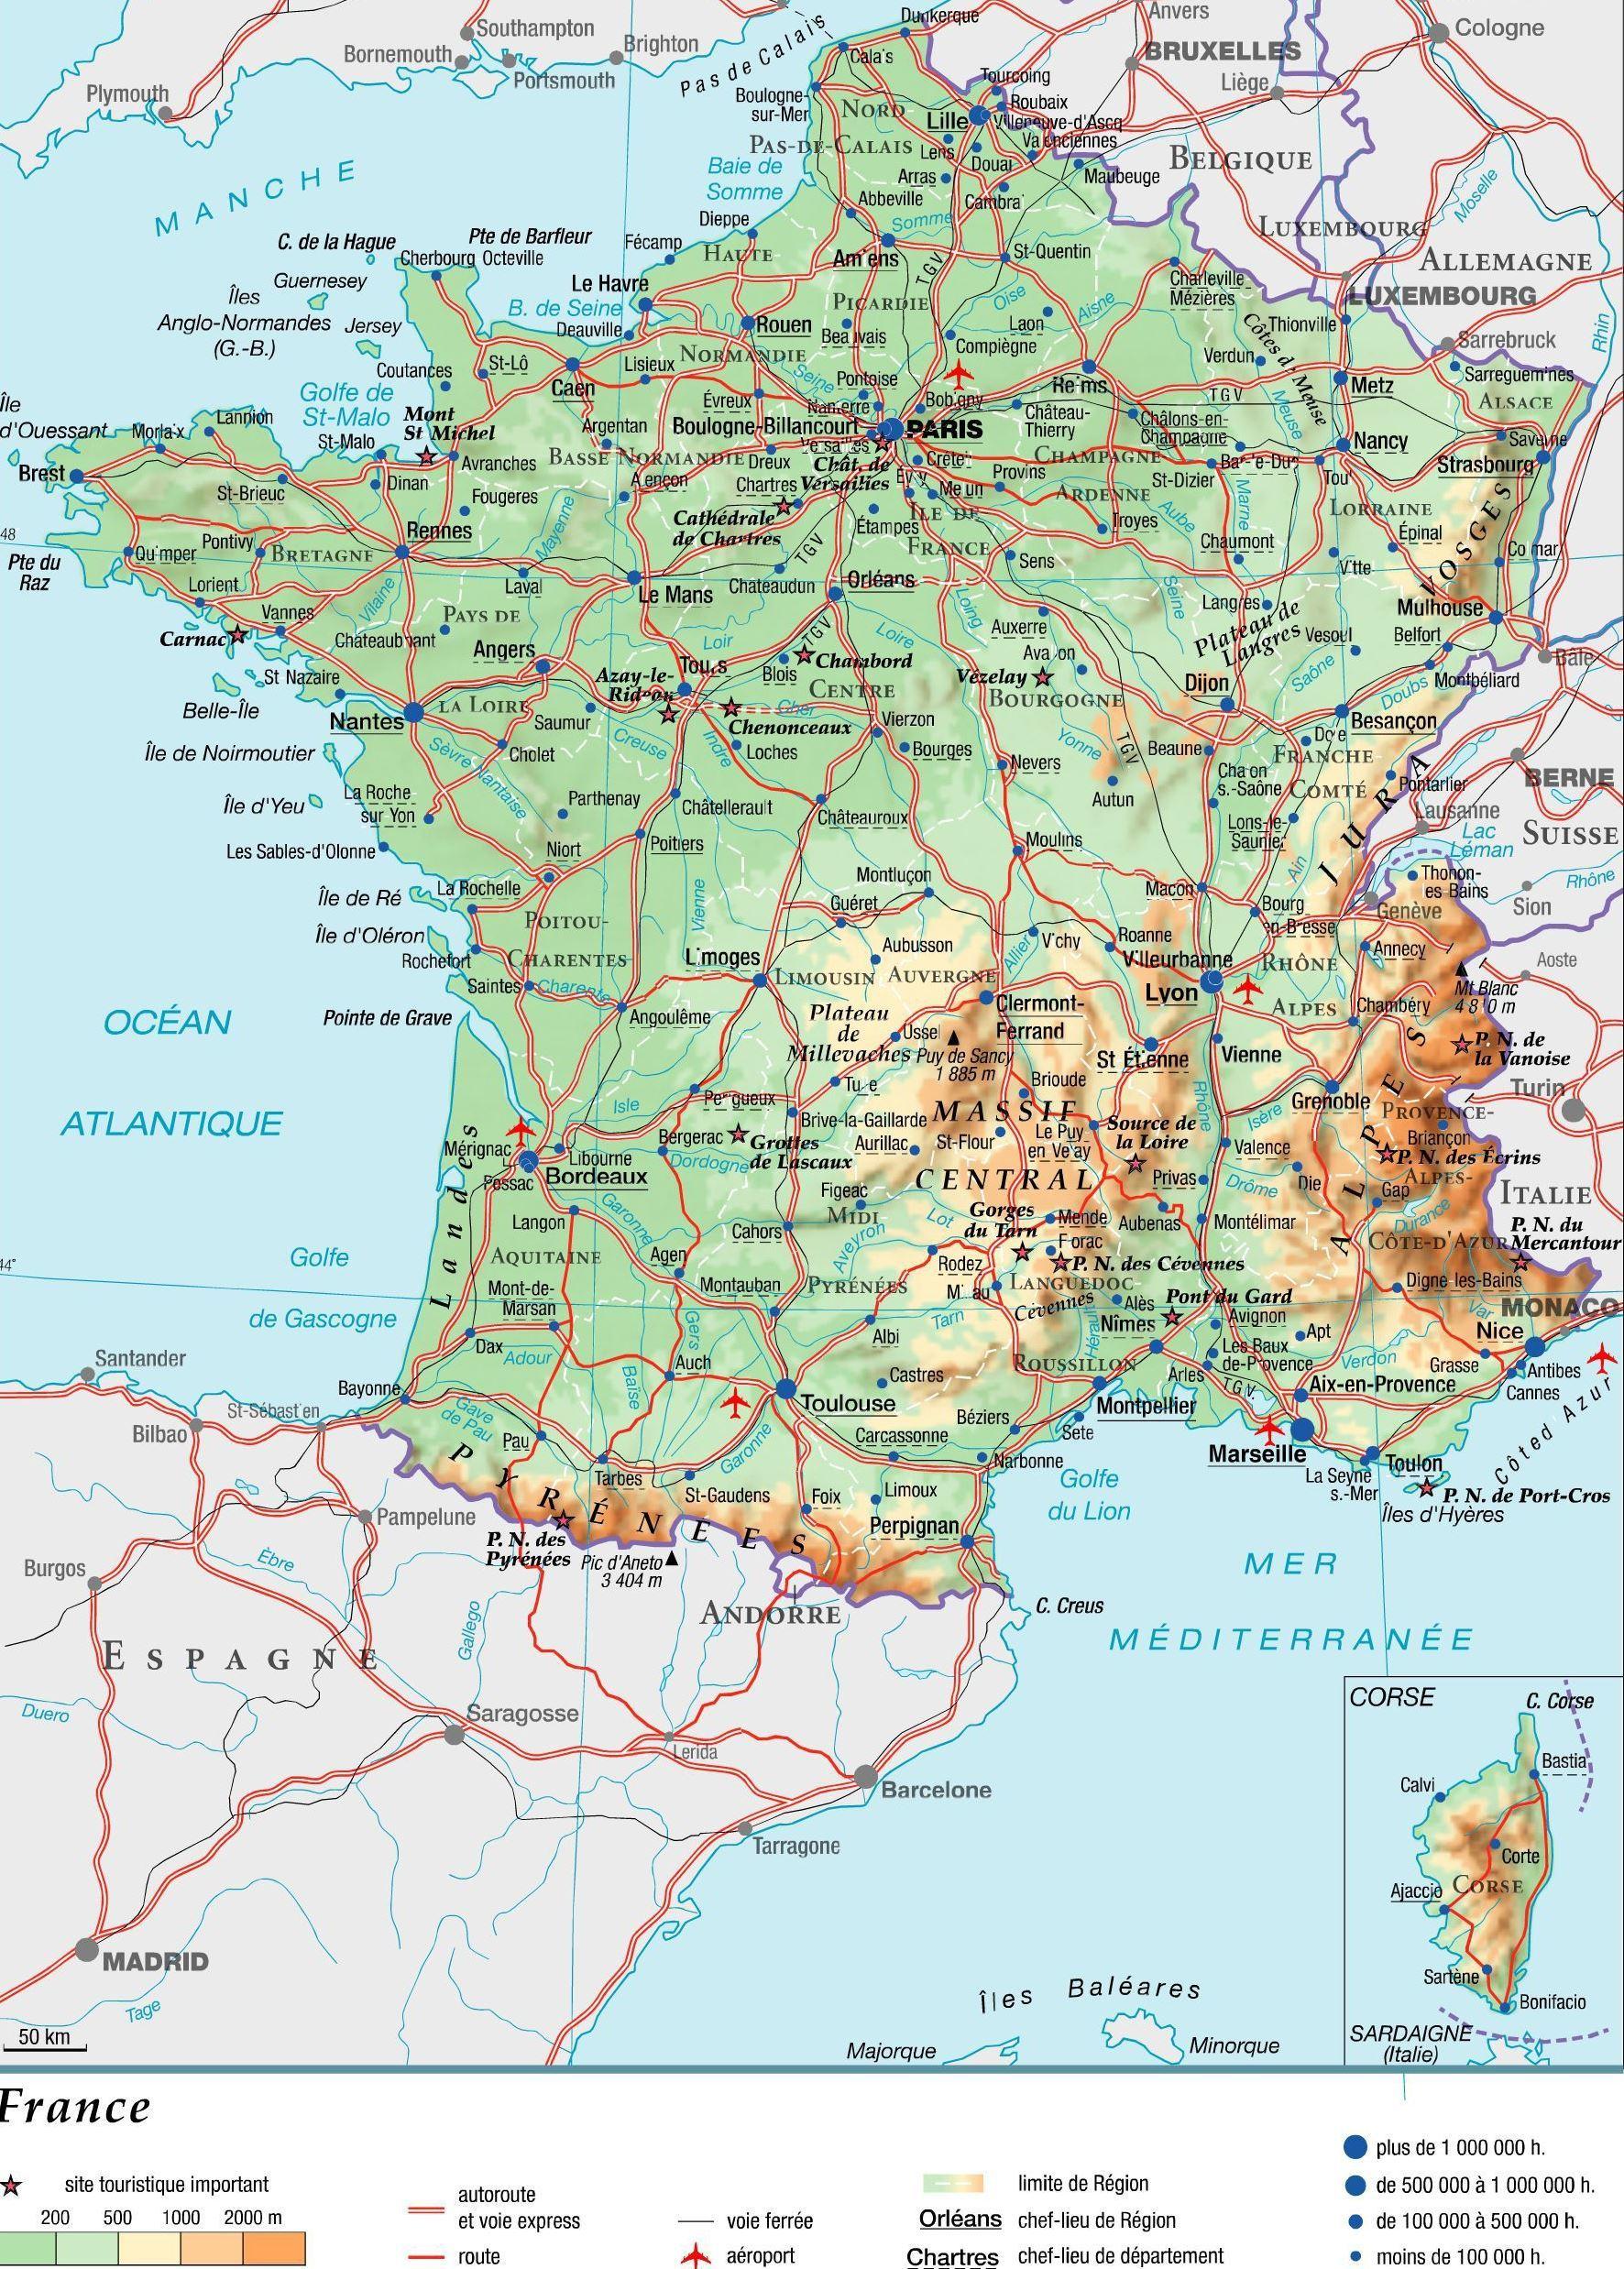 Karta Francii Na Russkom Yazyke S Gorodami Franciya Na Karte Mira